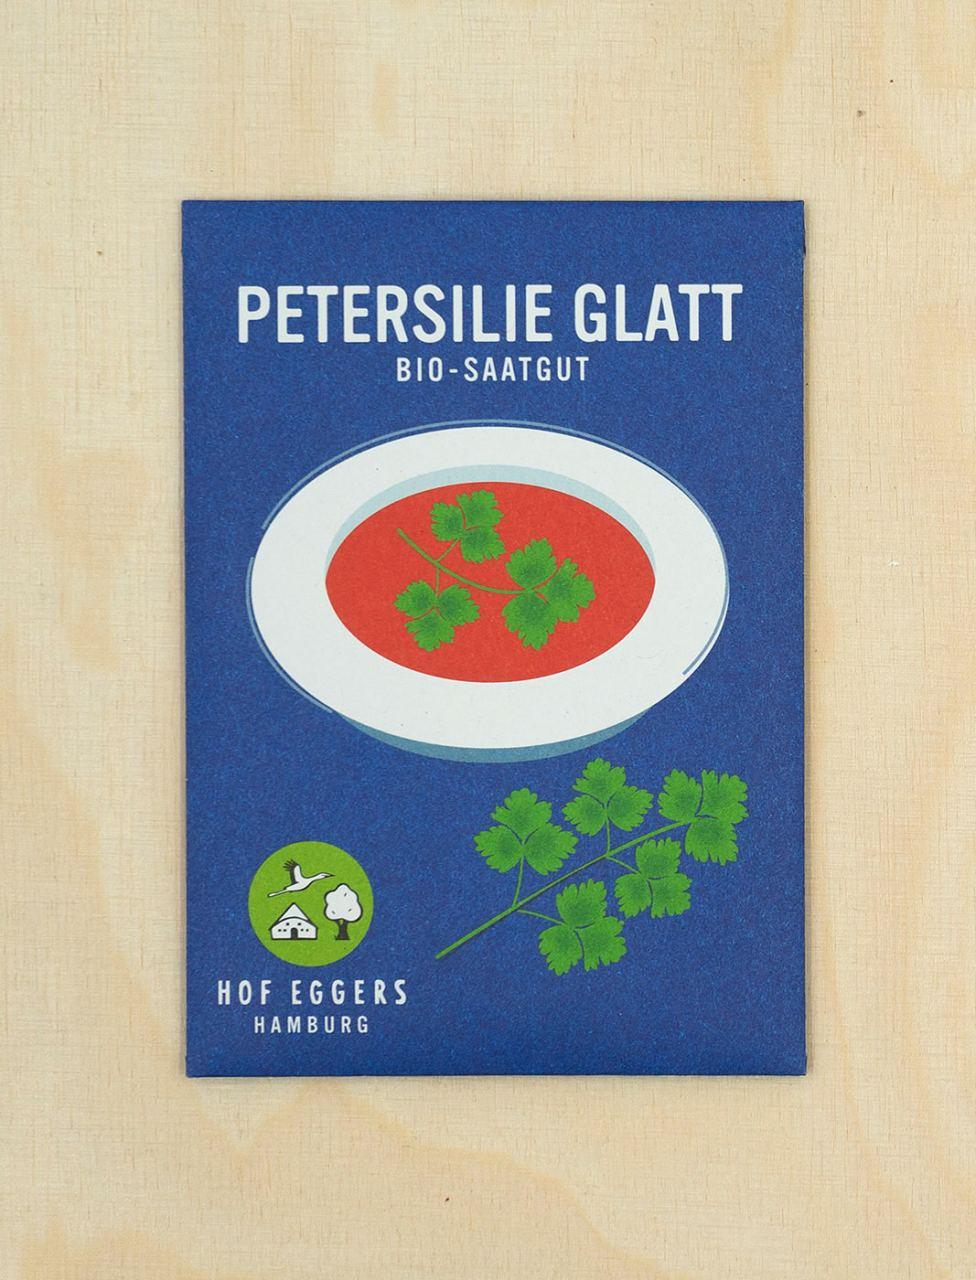 Petersilie Glatt, Bio-Saatgut